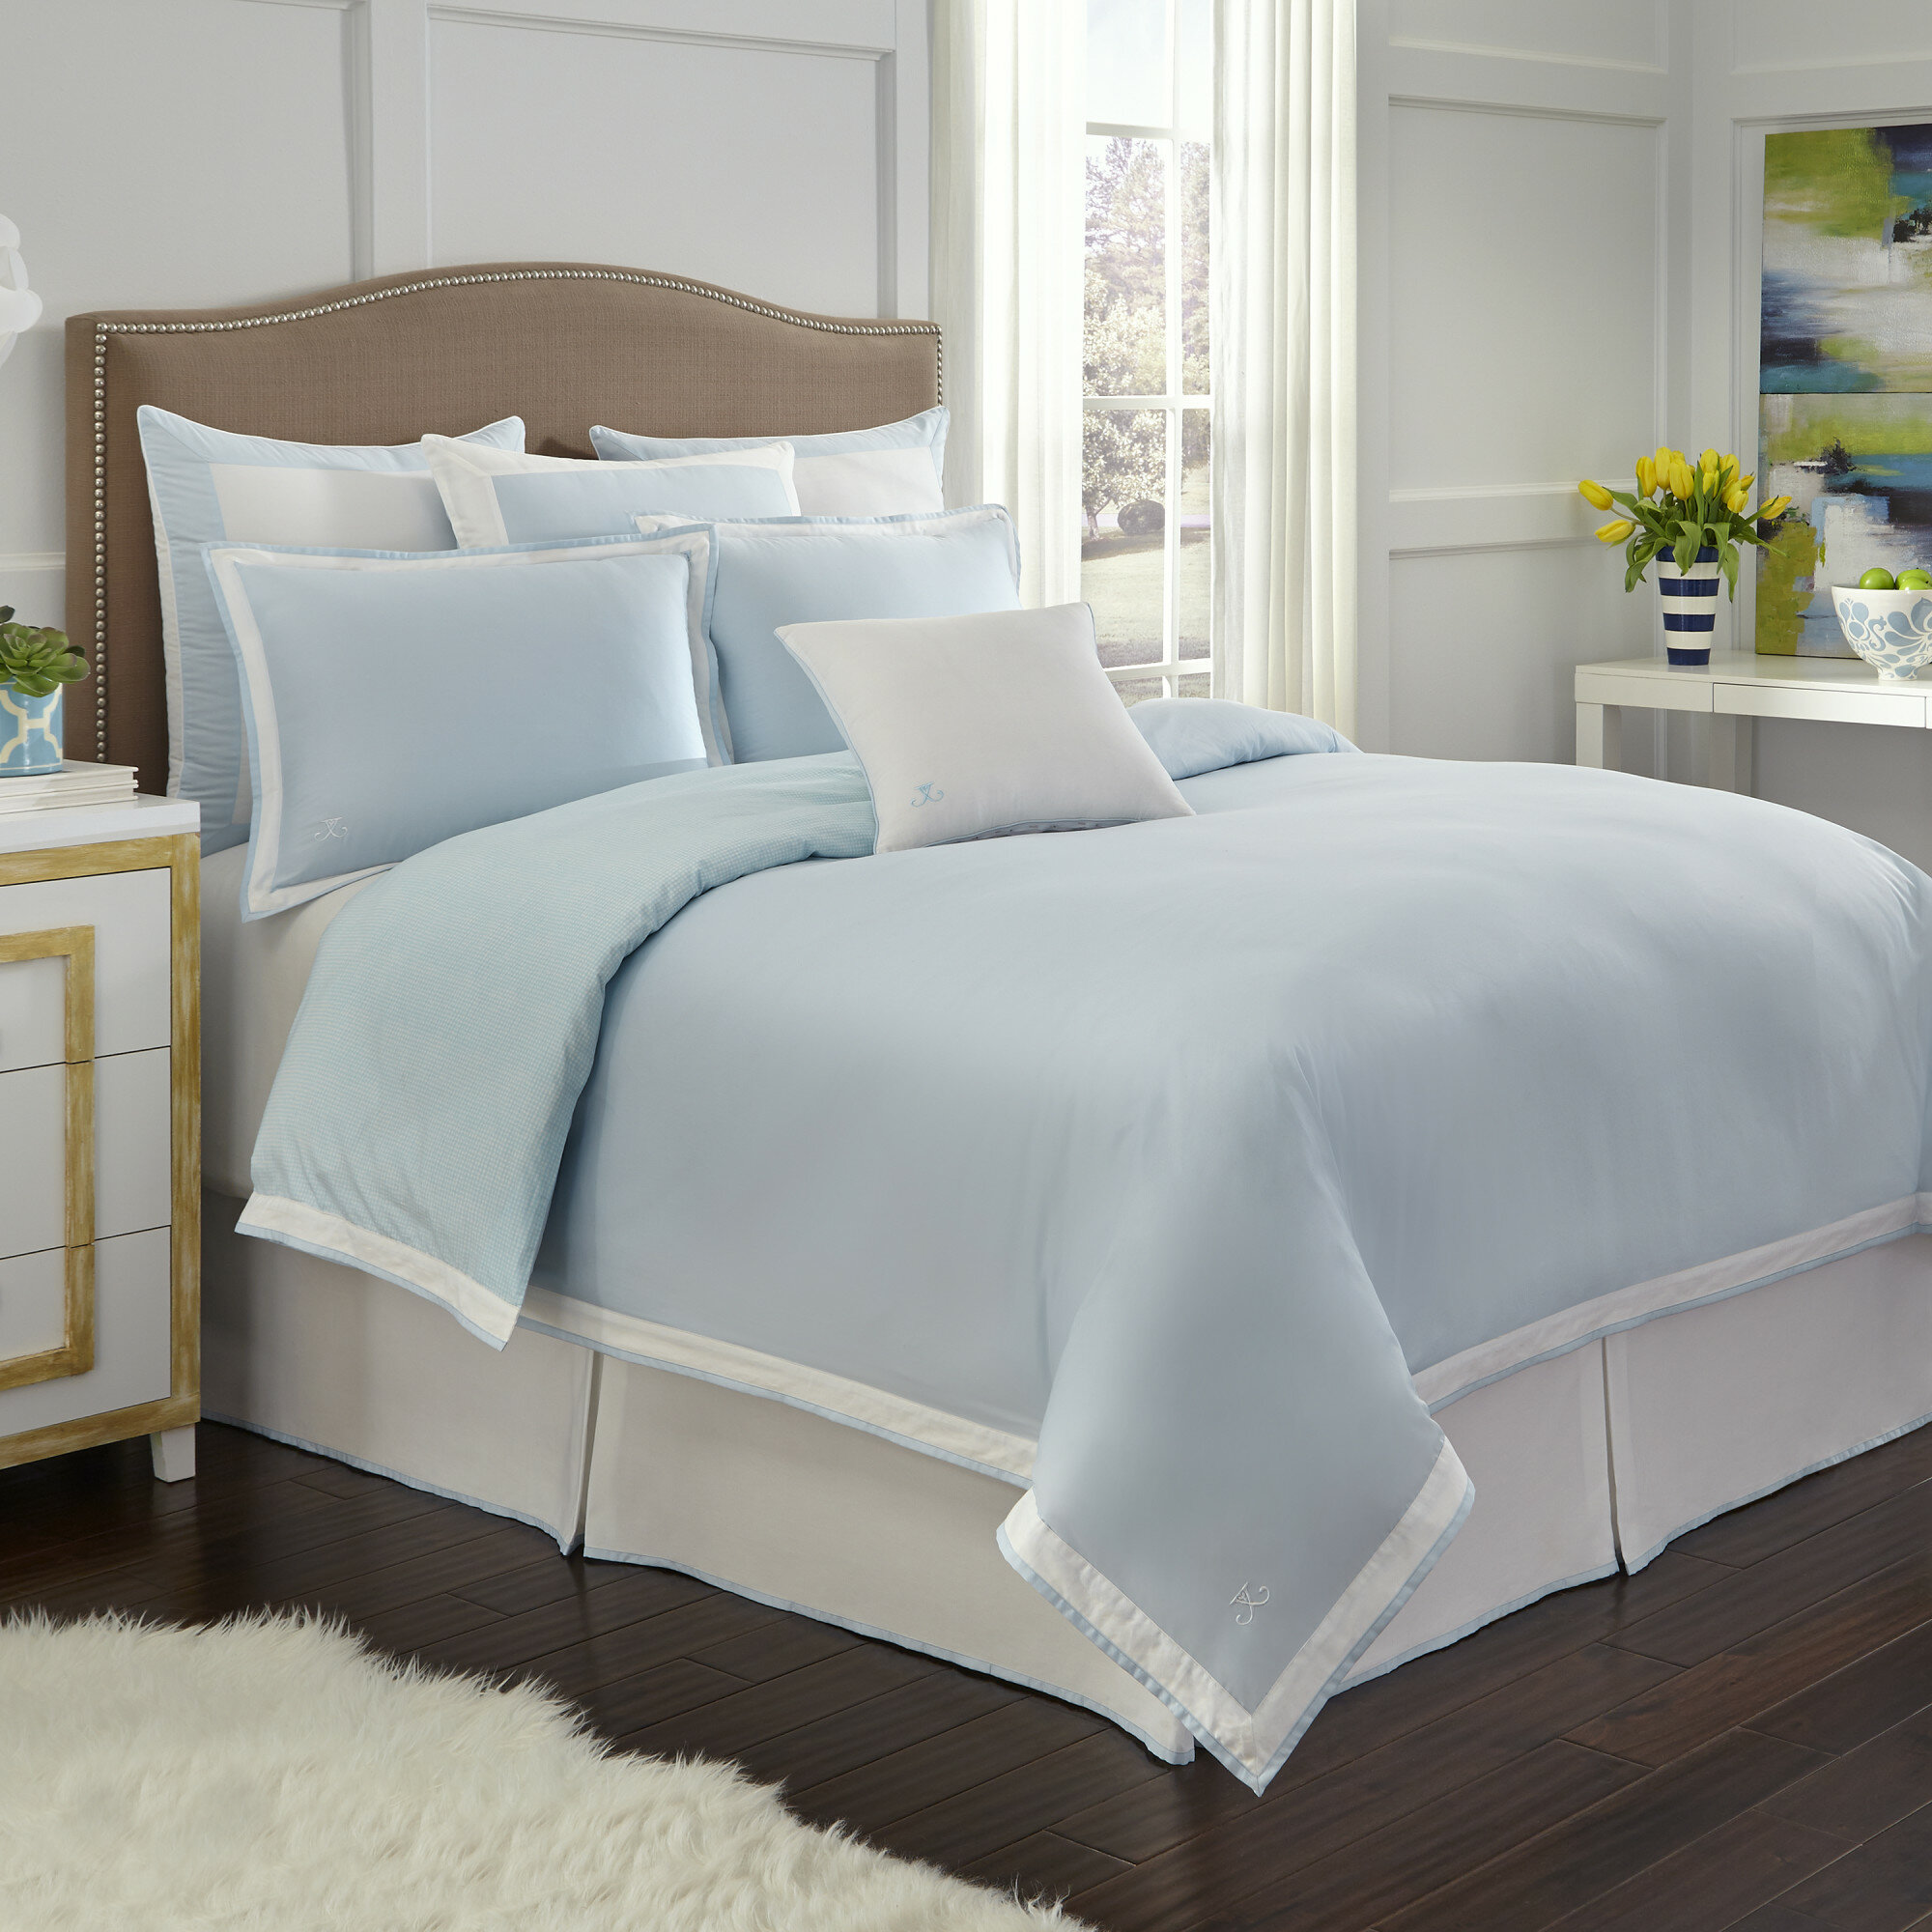 Jill Rosenwald Home Sugarhouse Comforter Set U0026 Reviews | Wayfair